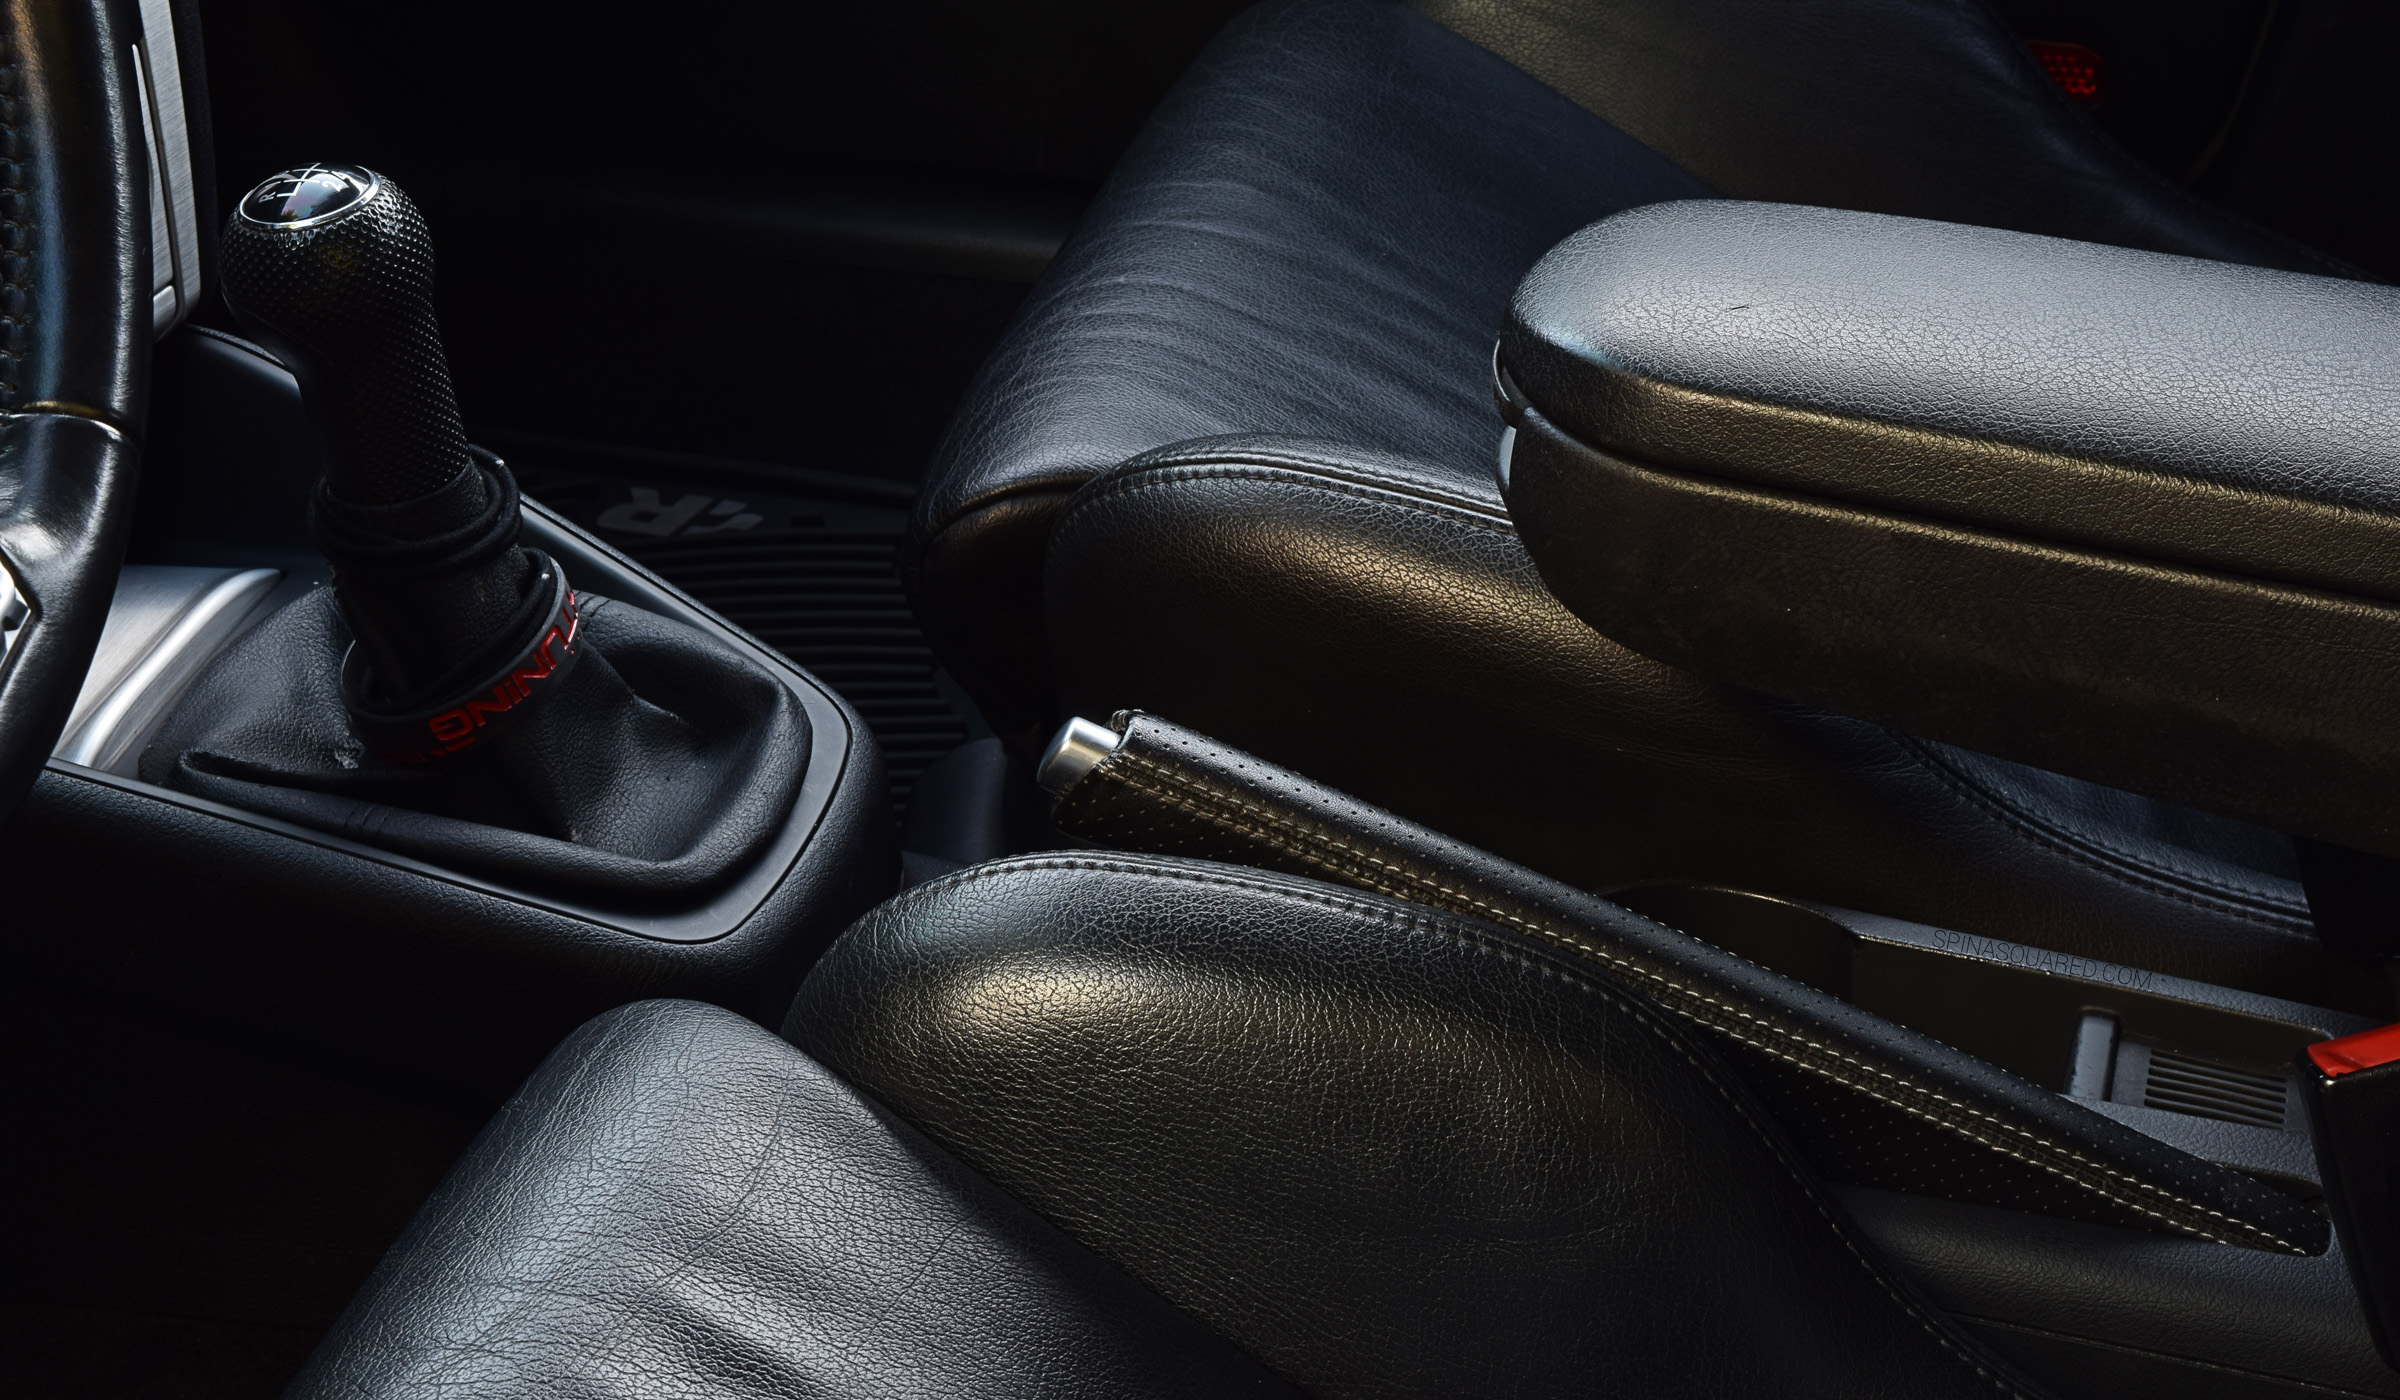 VW Golf 1.8T Interior Progress